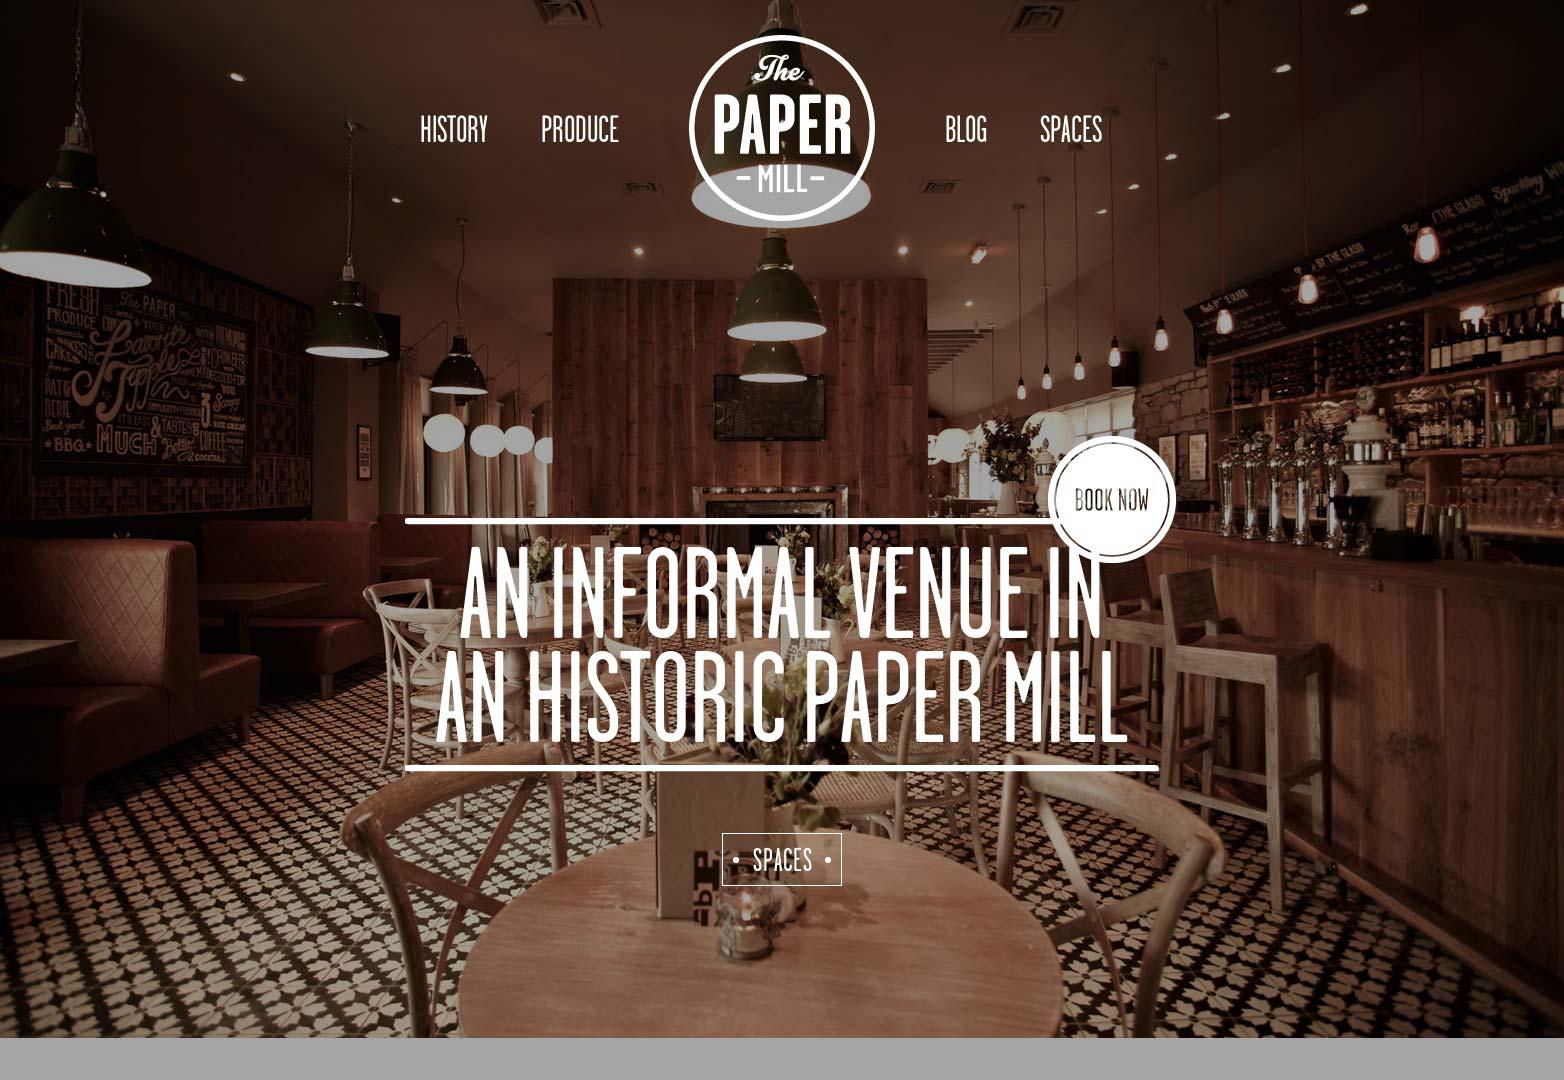 La fábrica de papel